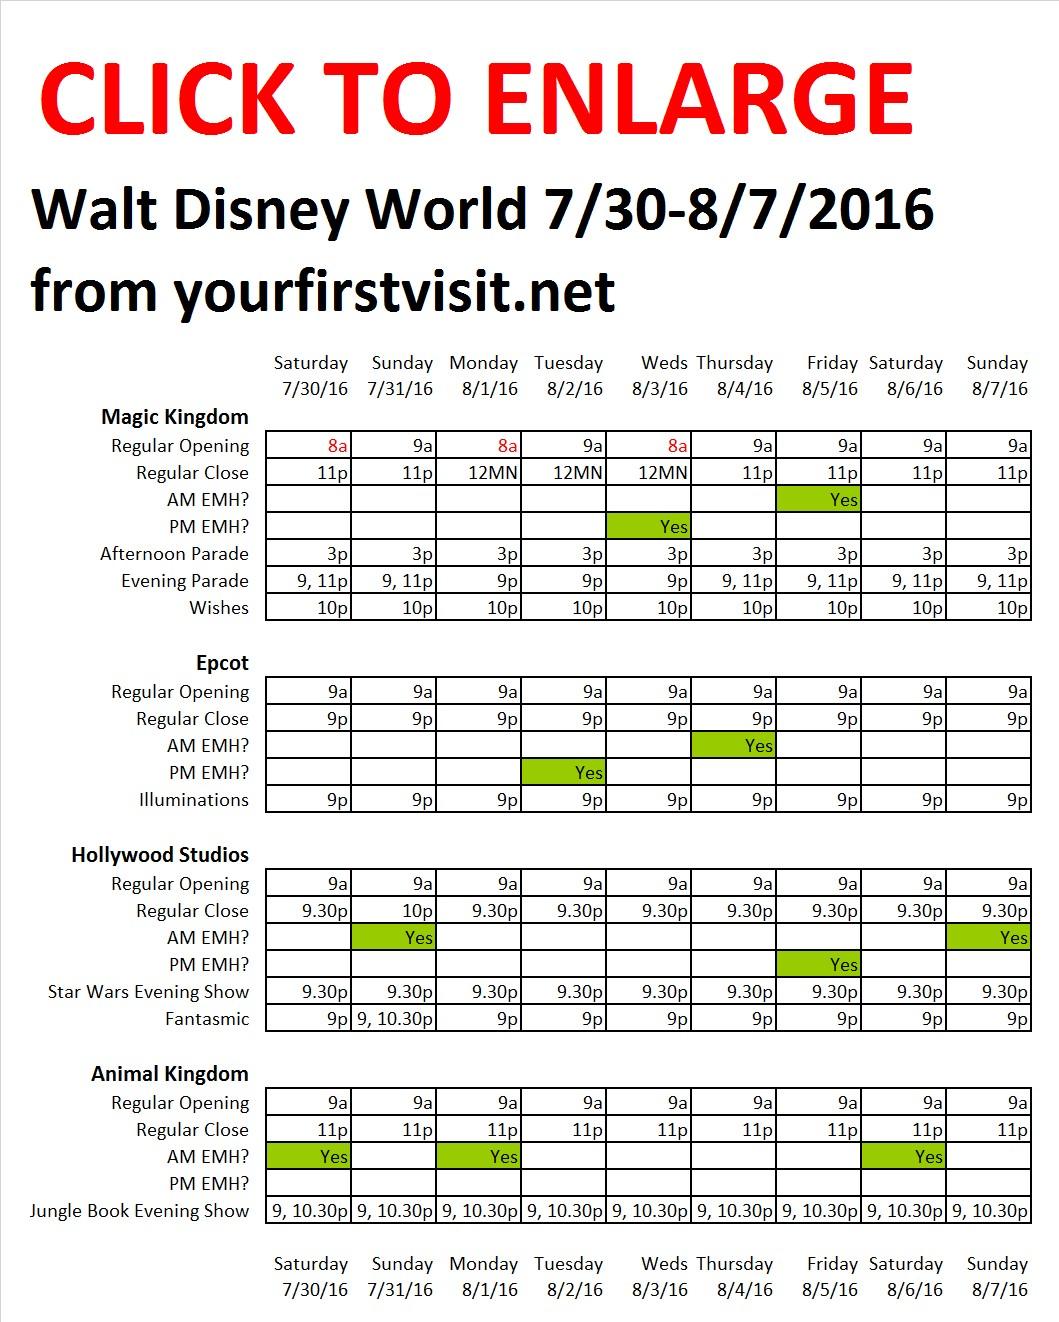 Disney World 7-30 to 8-7-2016 from yourfirstvisit.net